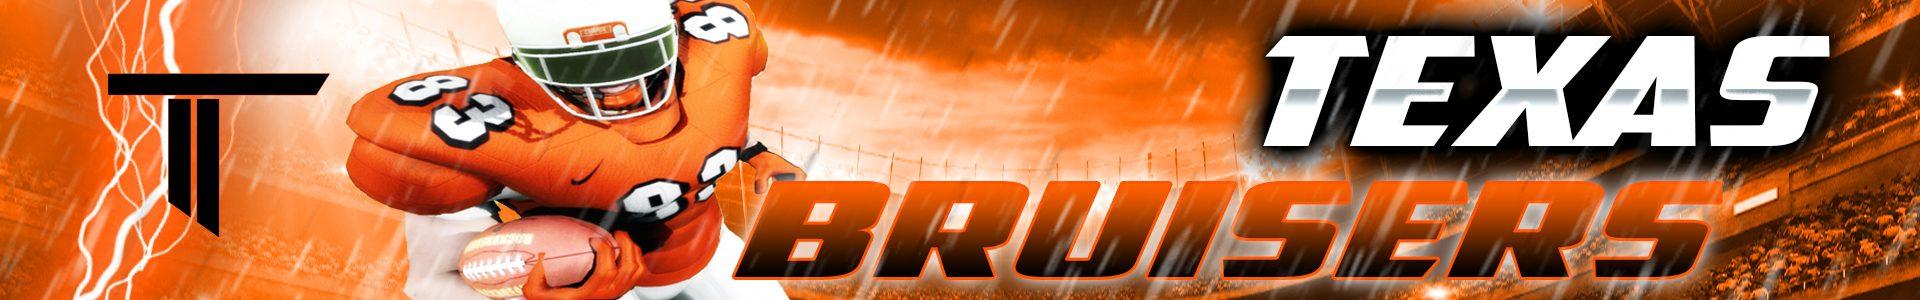 Texas Bruisers_Backbreaker BFL Wallpaper